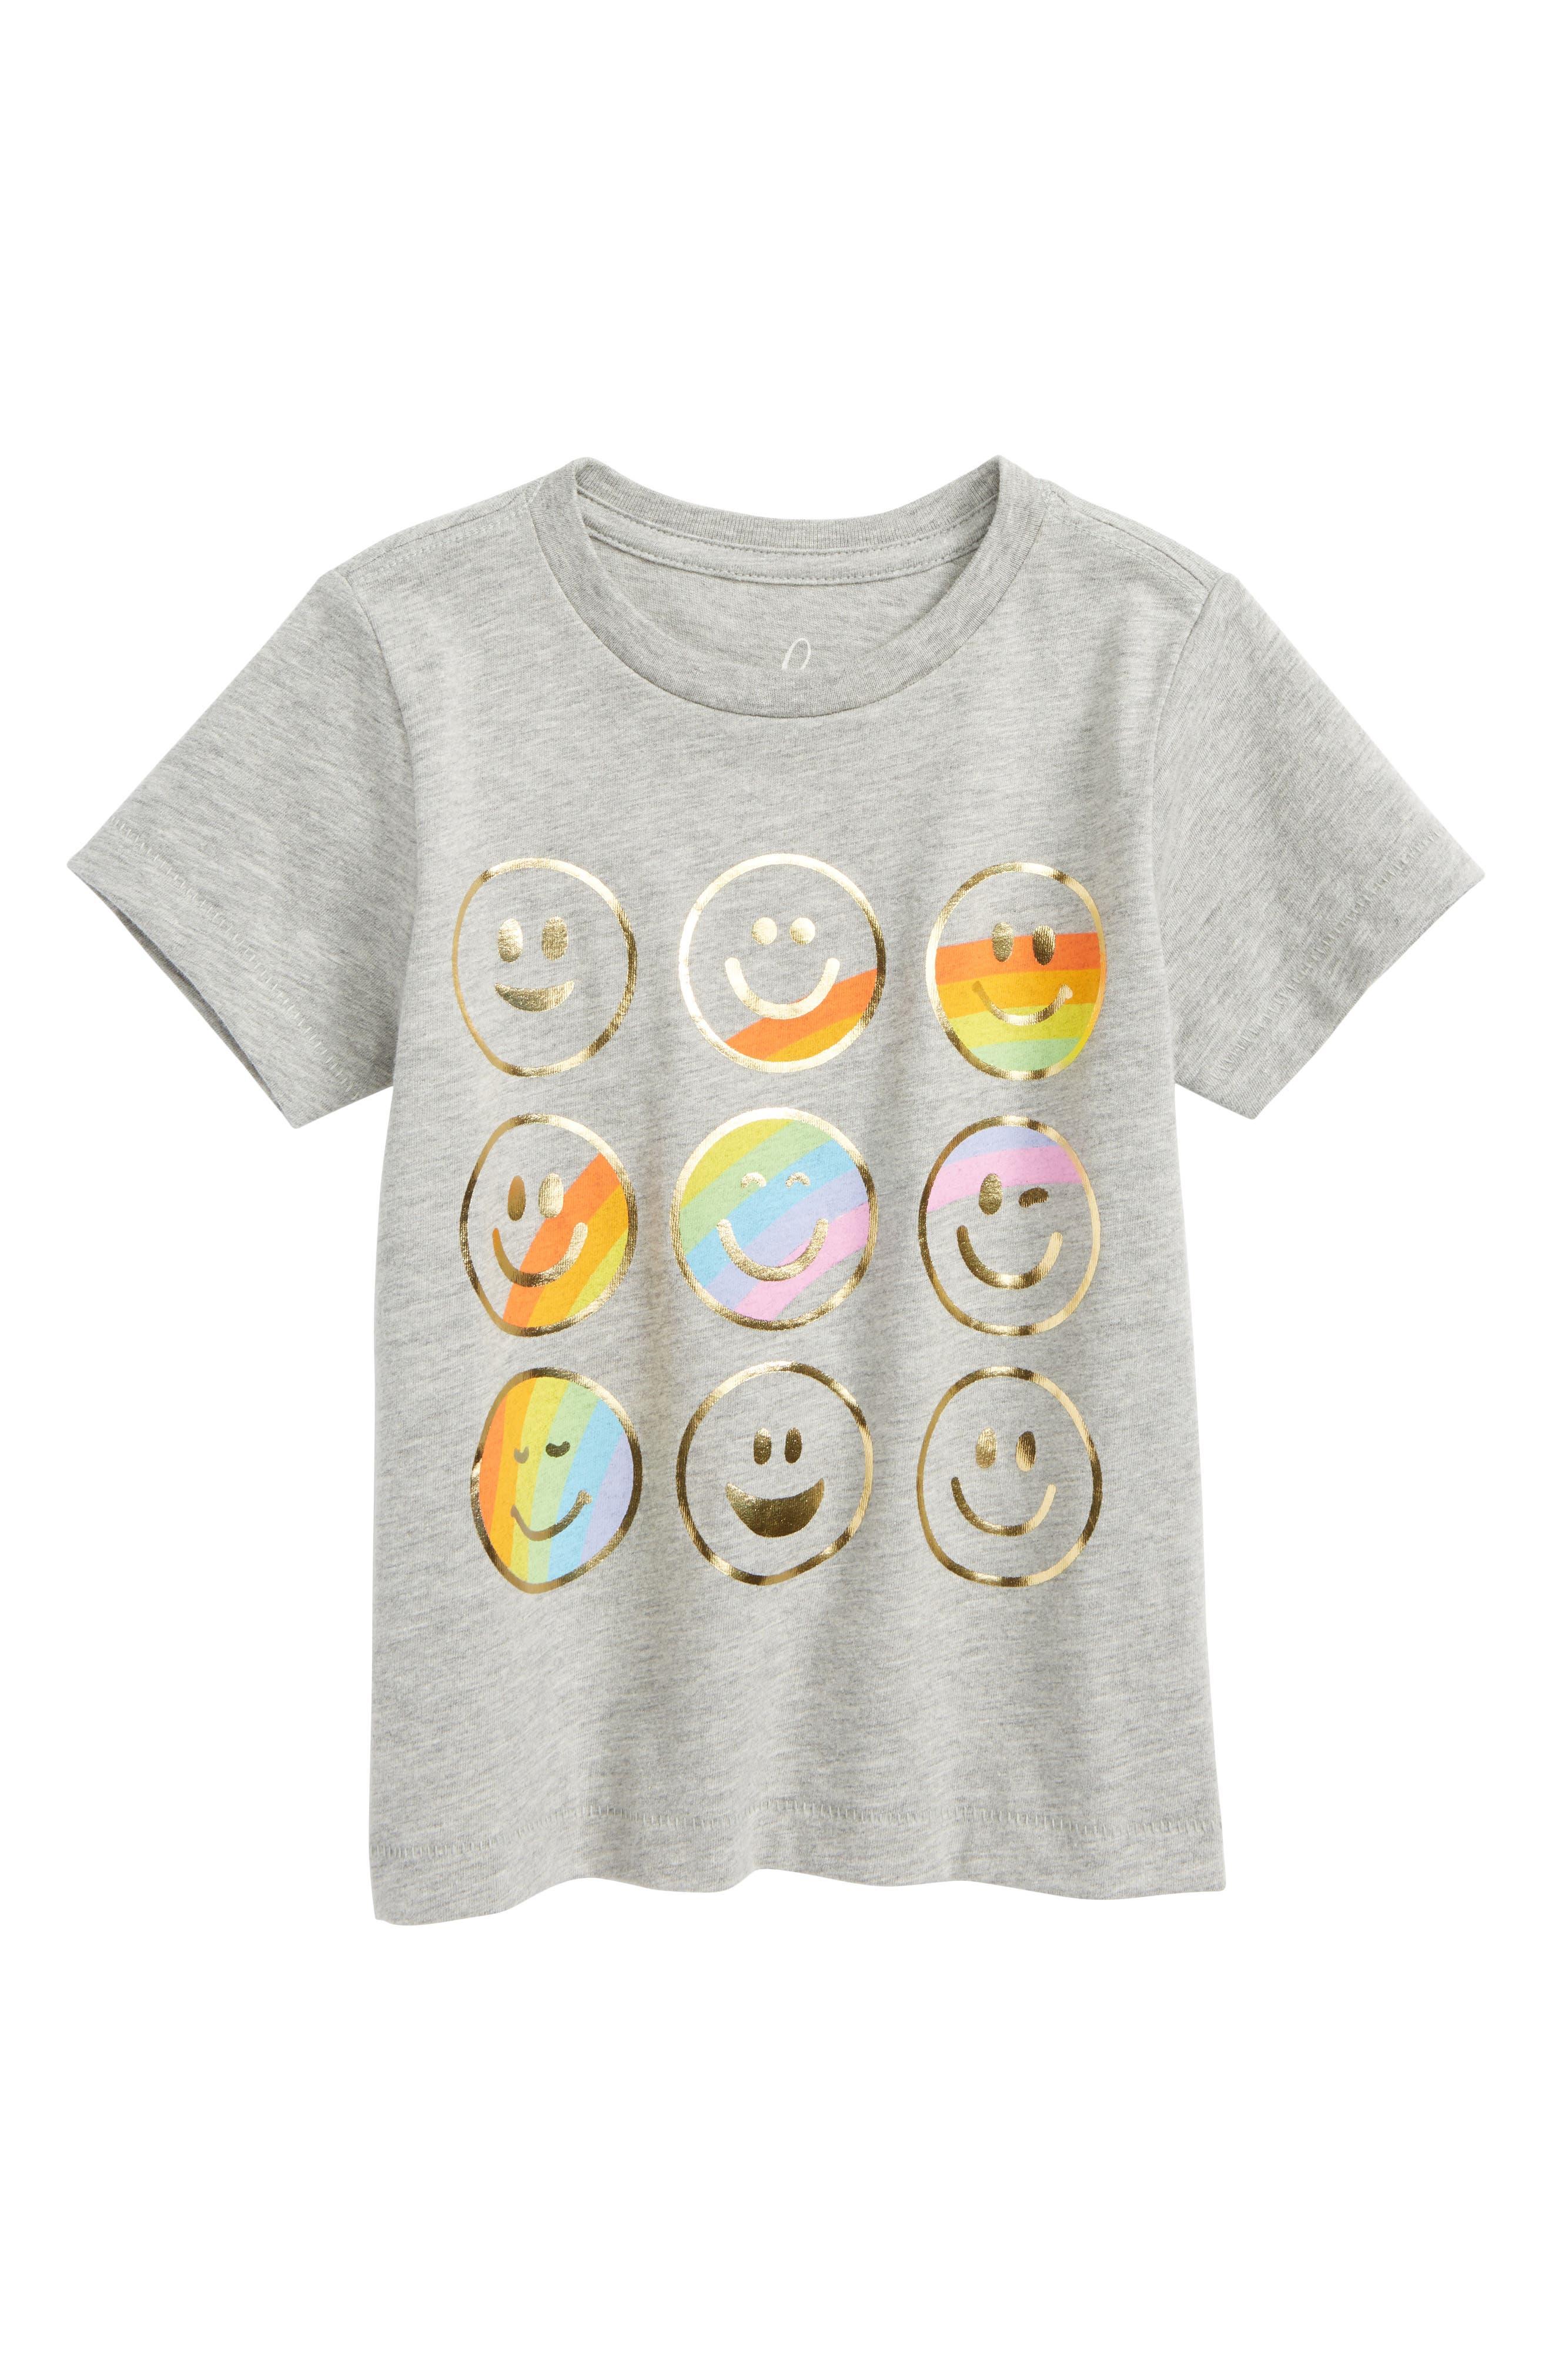 Emoticon Graphic Tee,                         Main,                         color, Light Grey Heather